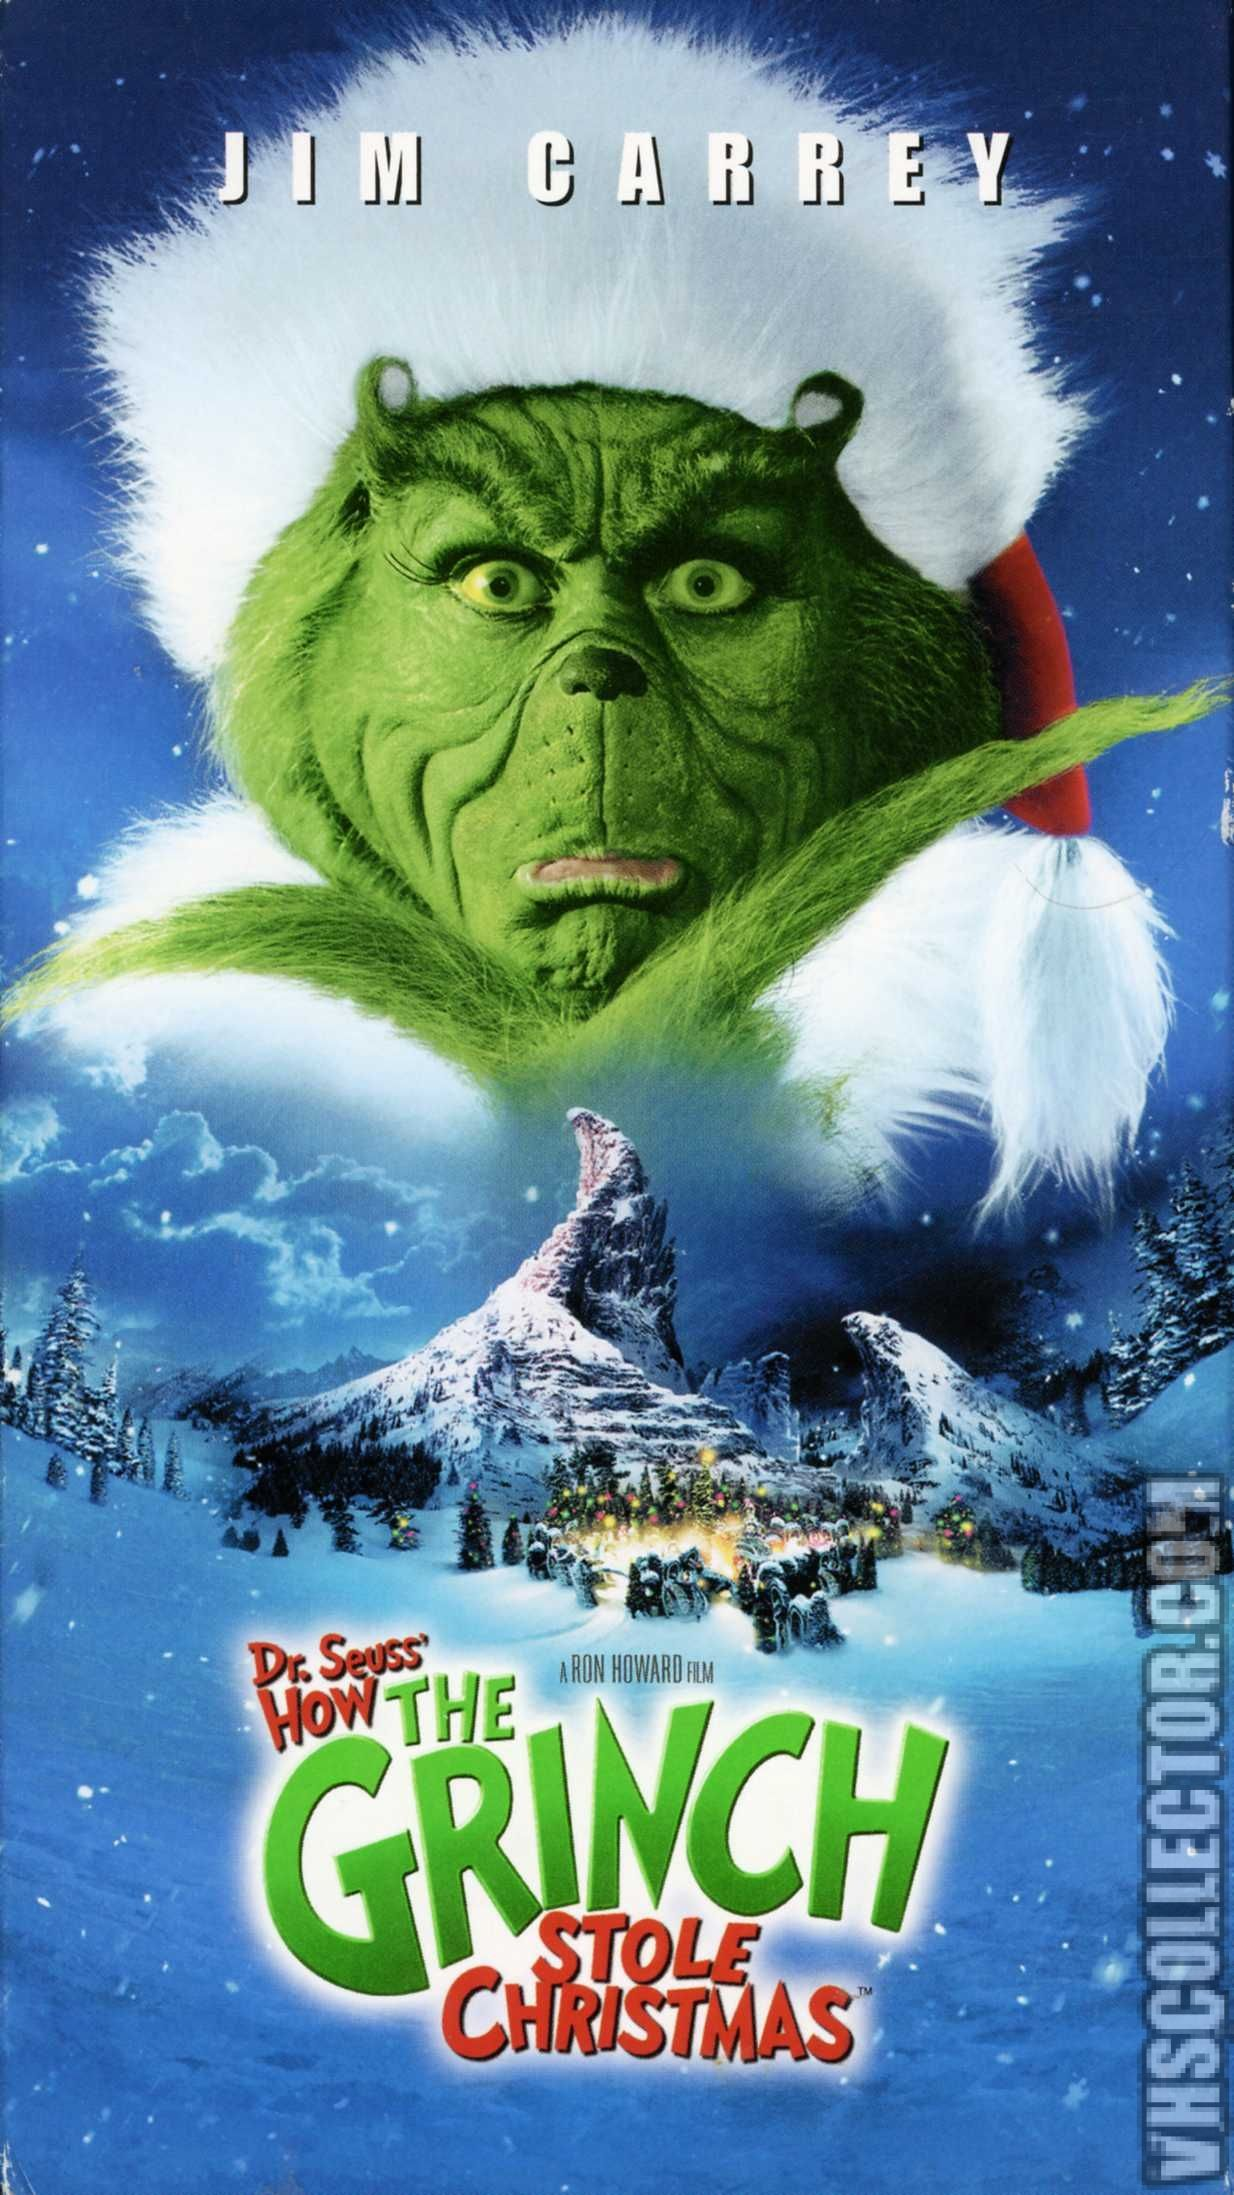 25 75 27x40 original 2 sided posterhow the grinch stole christmas - How The Grinch Stole Christmas Movie Online